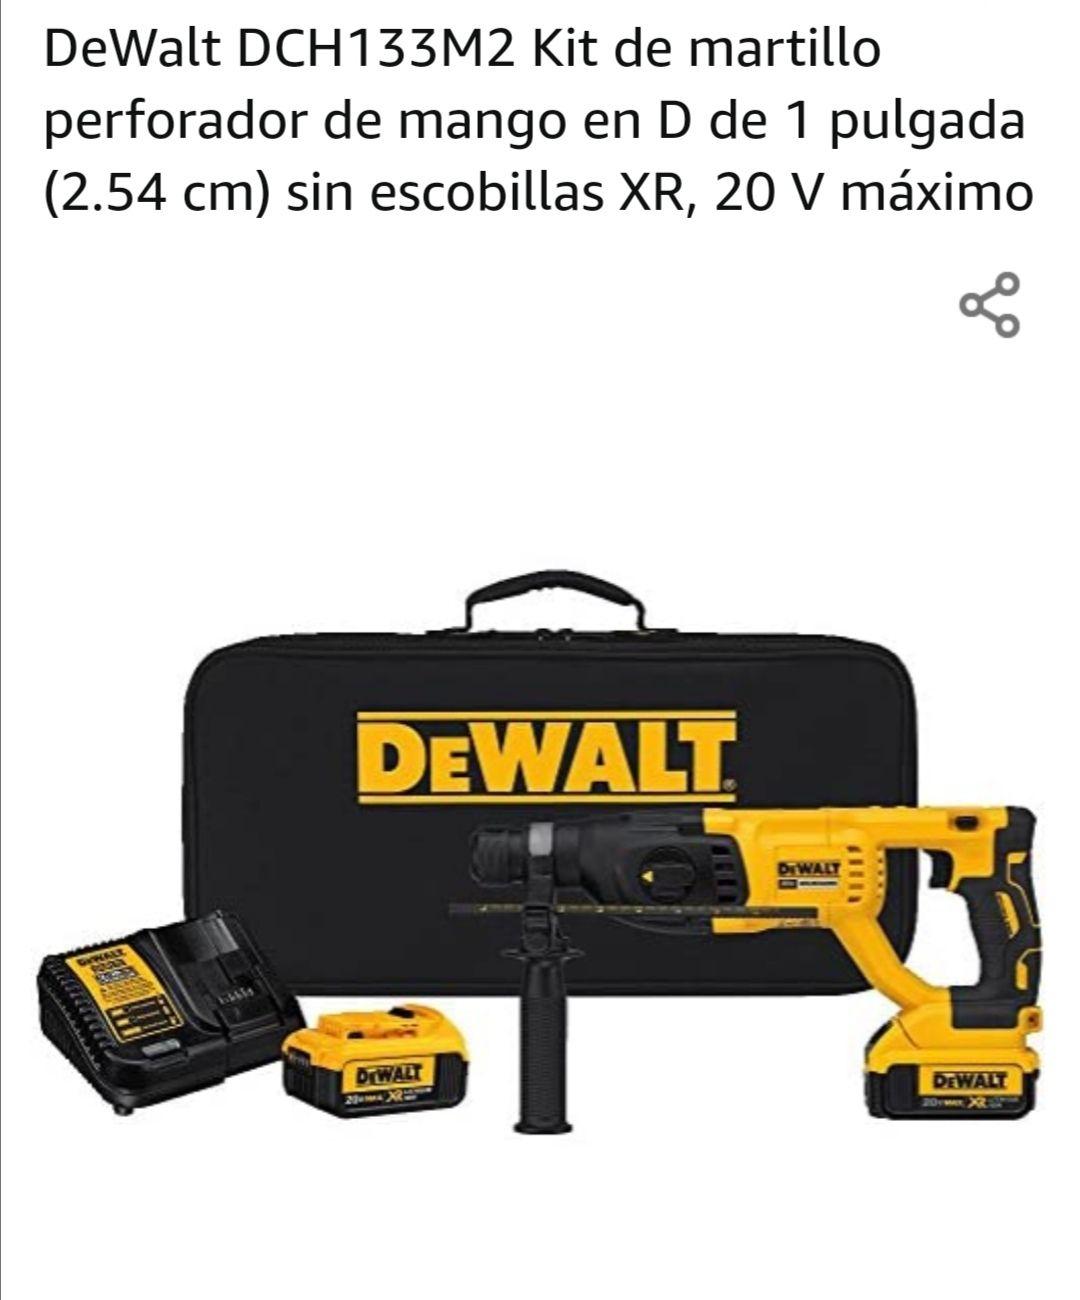 Amazon: DeWalt DCH133M2 Kit de martillo perforador de mango en D de 1 pulgada (2.54 cm) sin escobillas XR, 20 V máximo